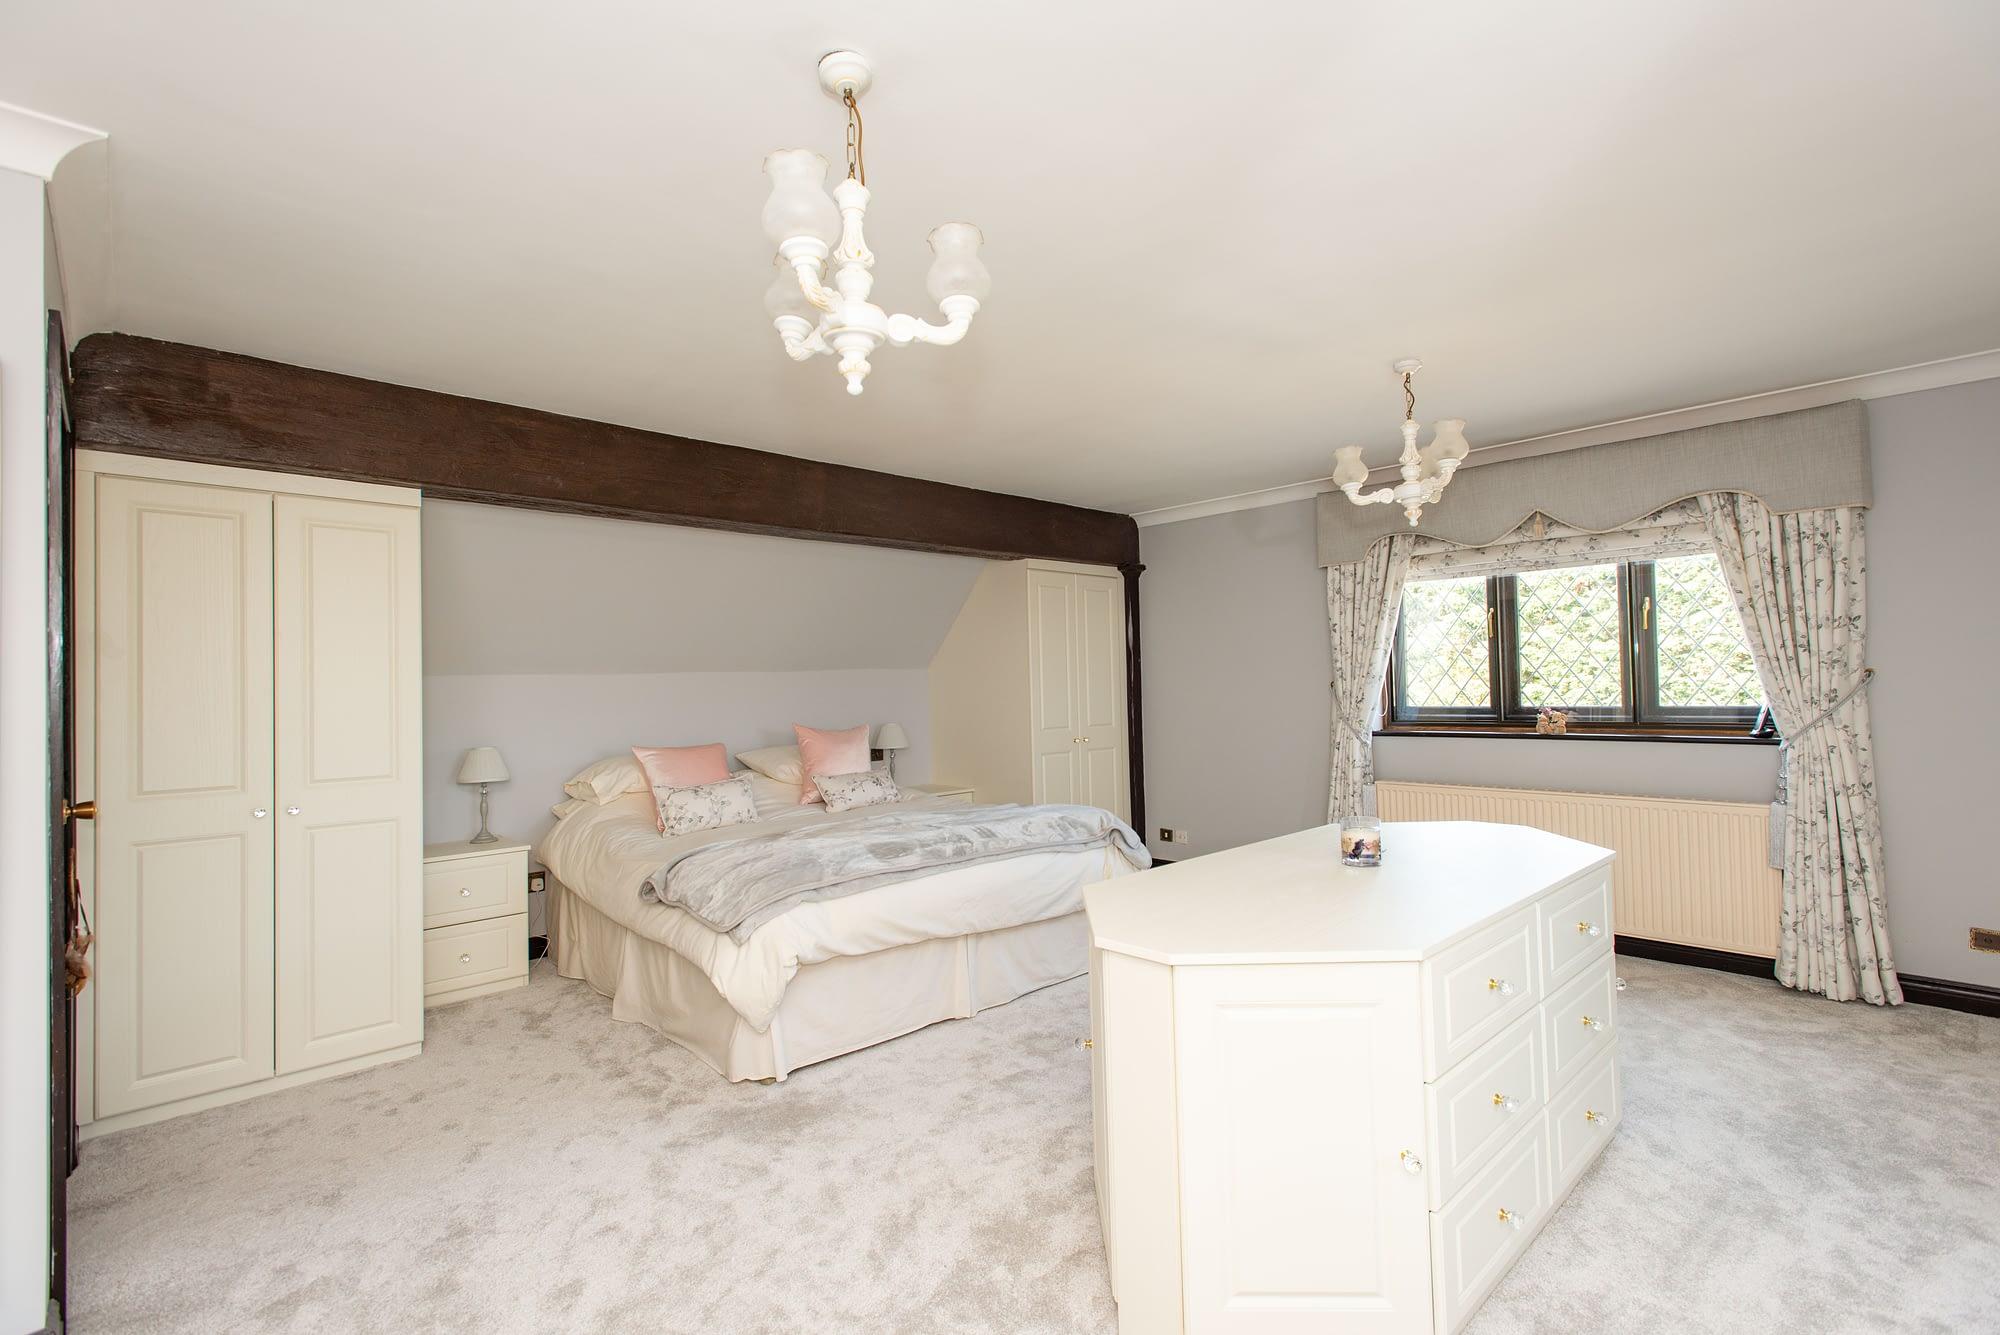 Custom bedroom furniture incorporating central island